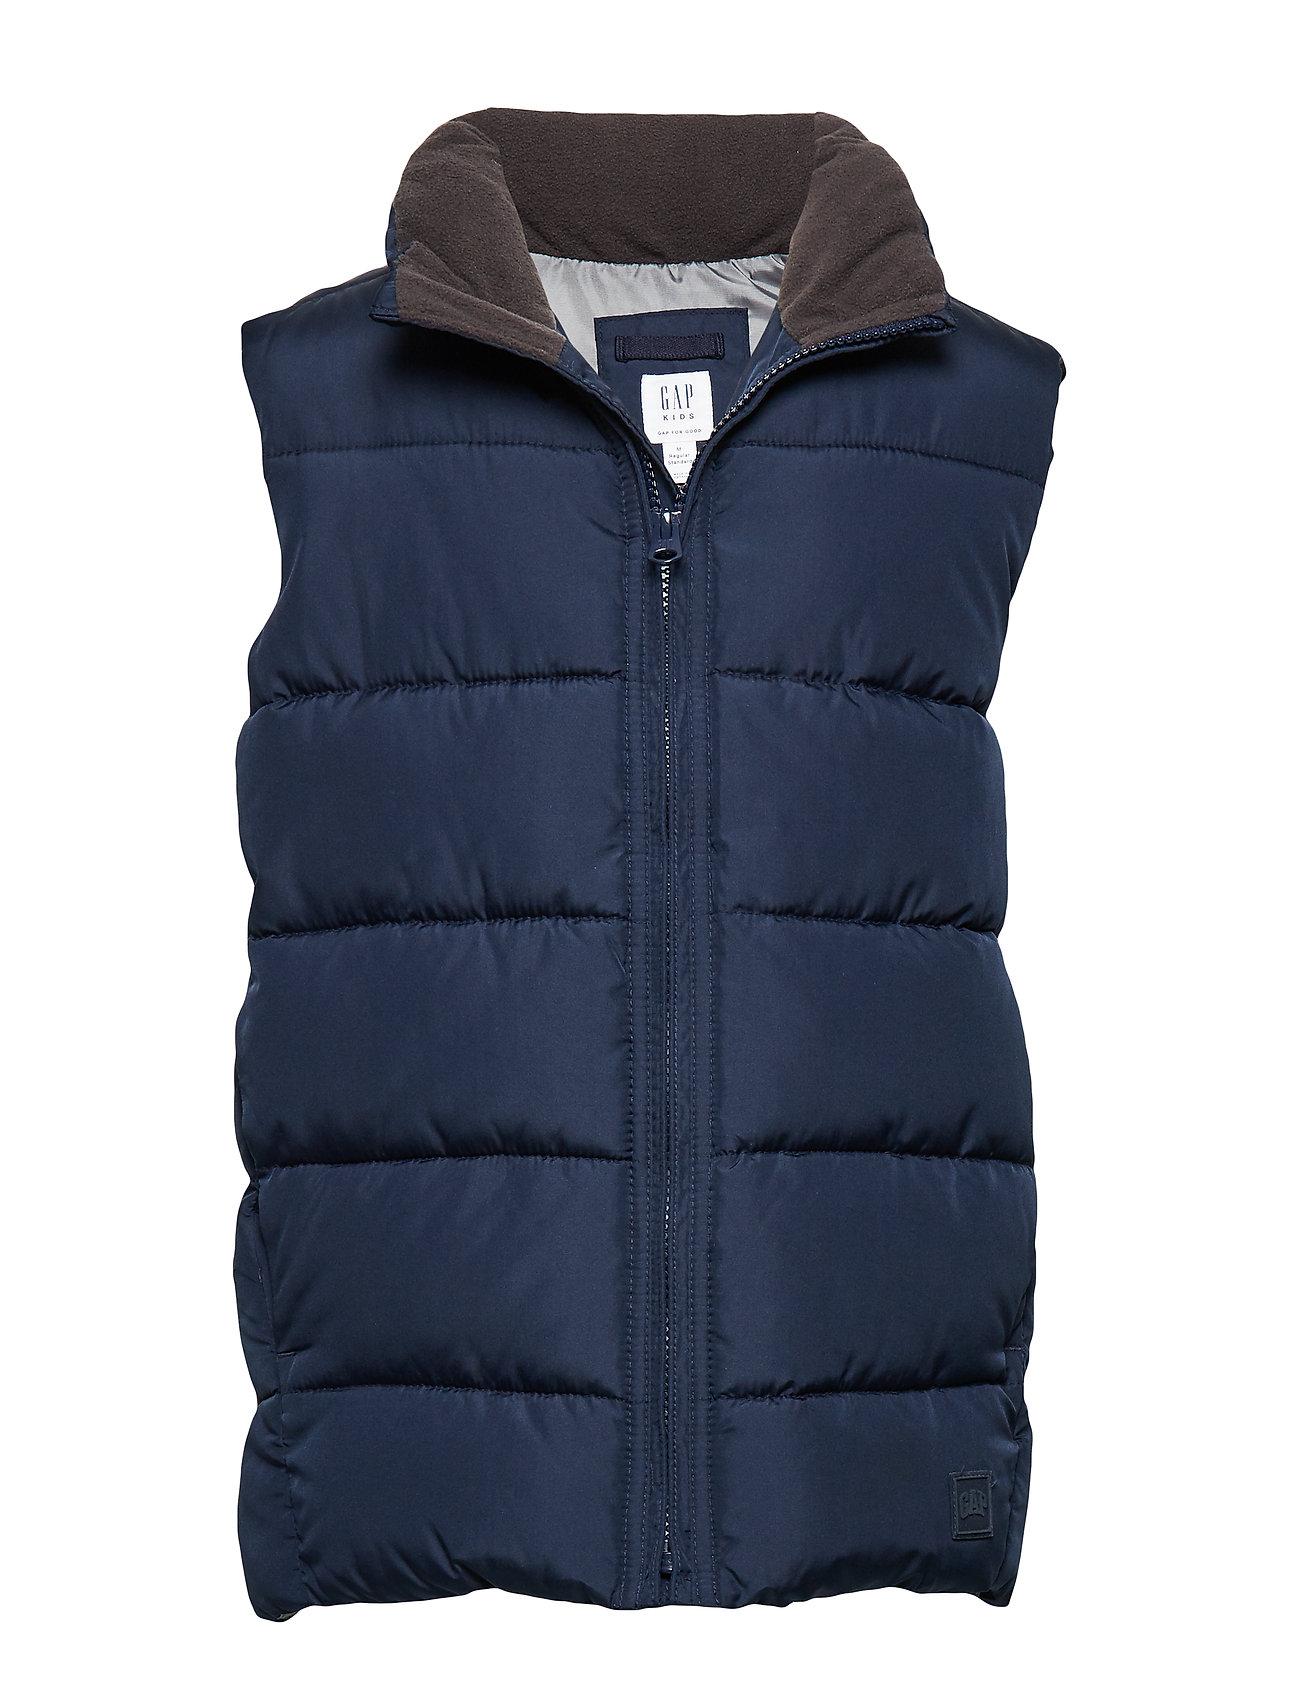 GAP Kids ColdControl Max Puffer Vest - TAPESTRY NAVY